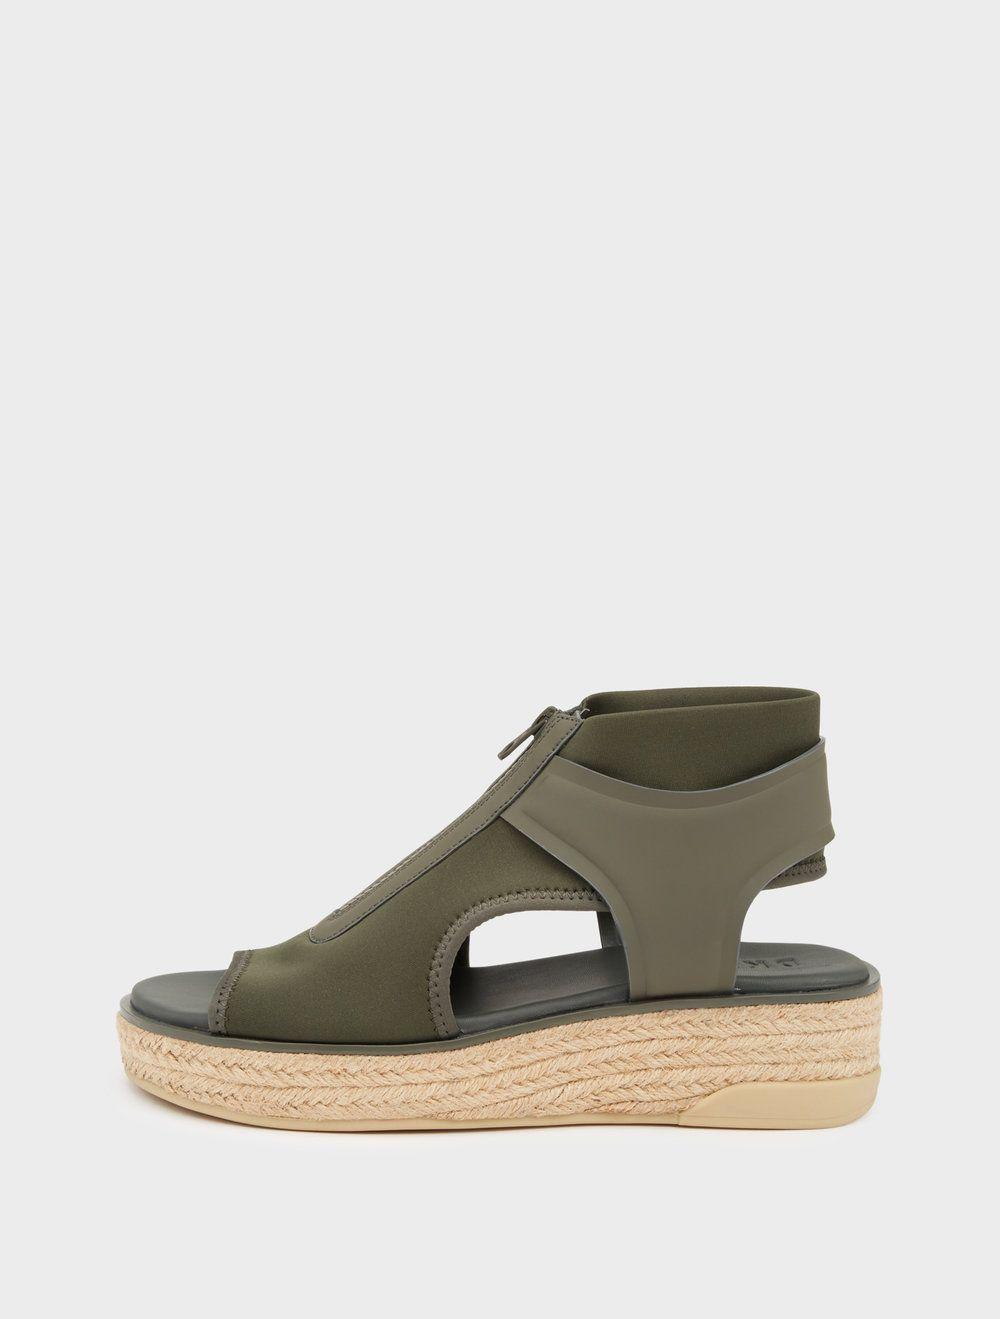 dkny slippers online